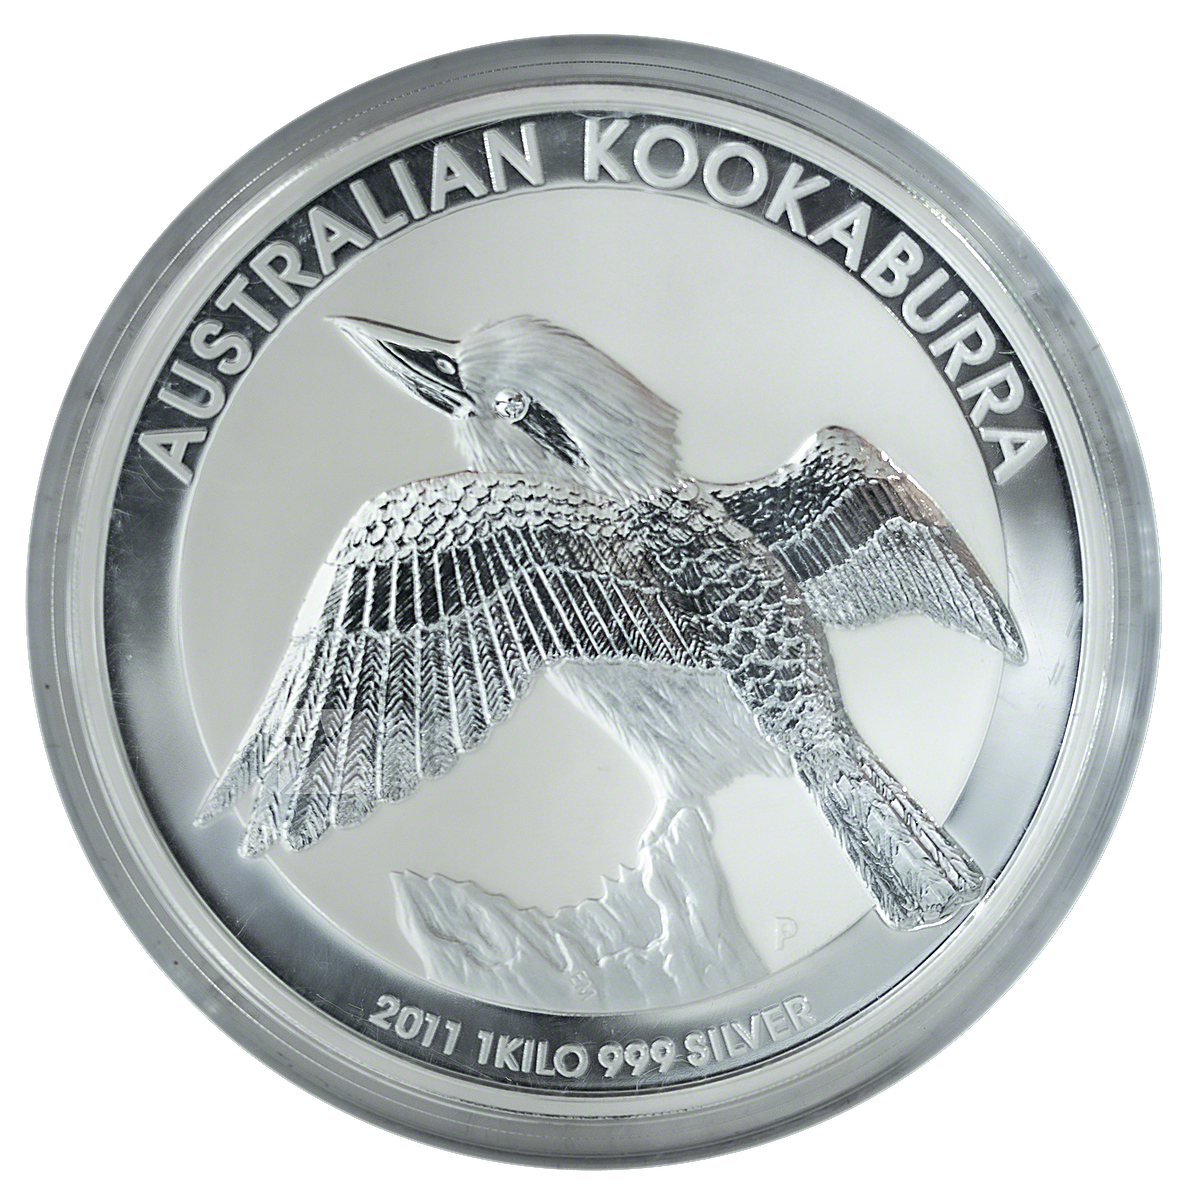 Australian Silver Kookaburra 2011